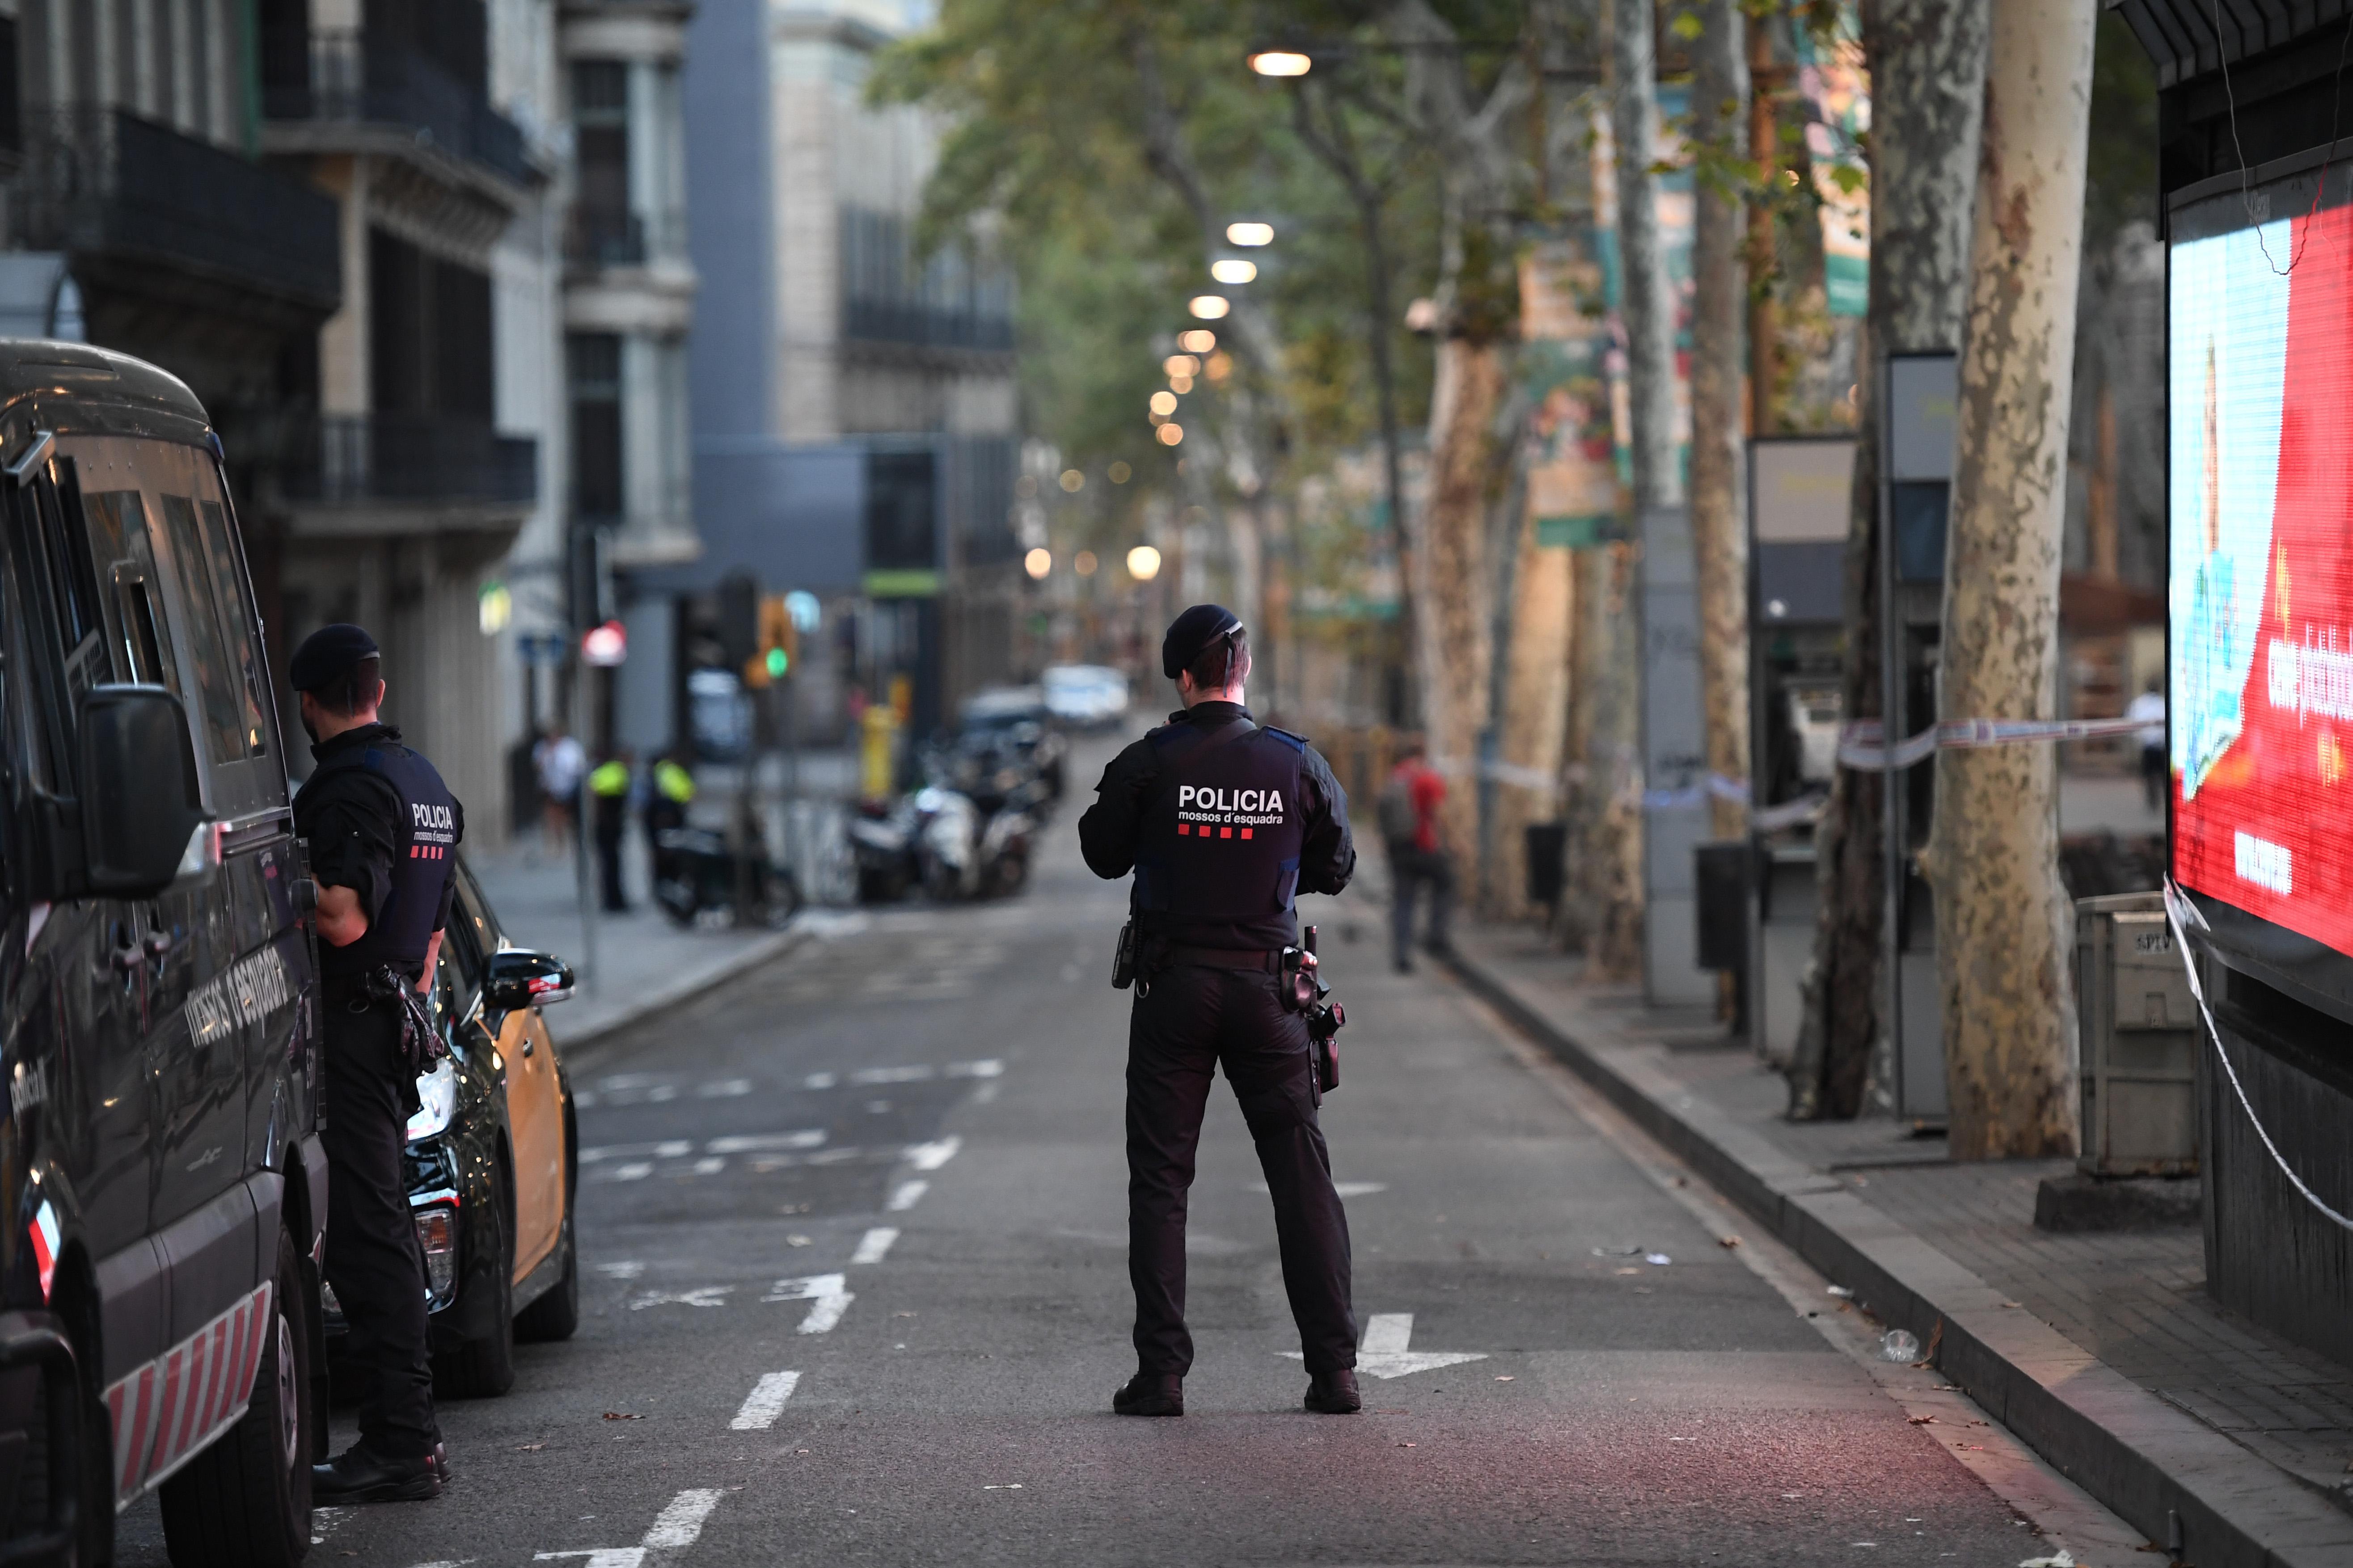 A police officer patrols on Las Ramblas following yesterday's terrorist attack, on Aug. 18, 2017 in Barcelona.